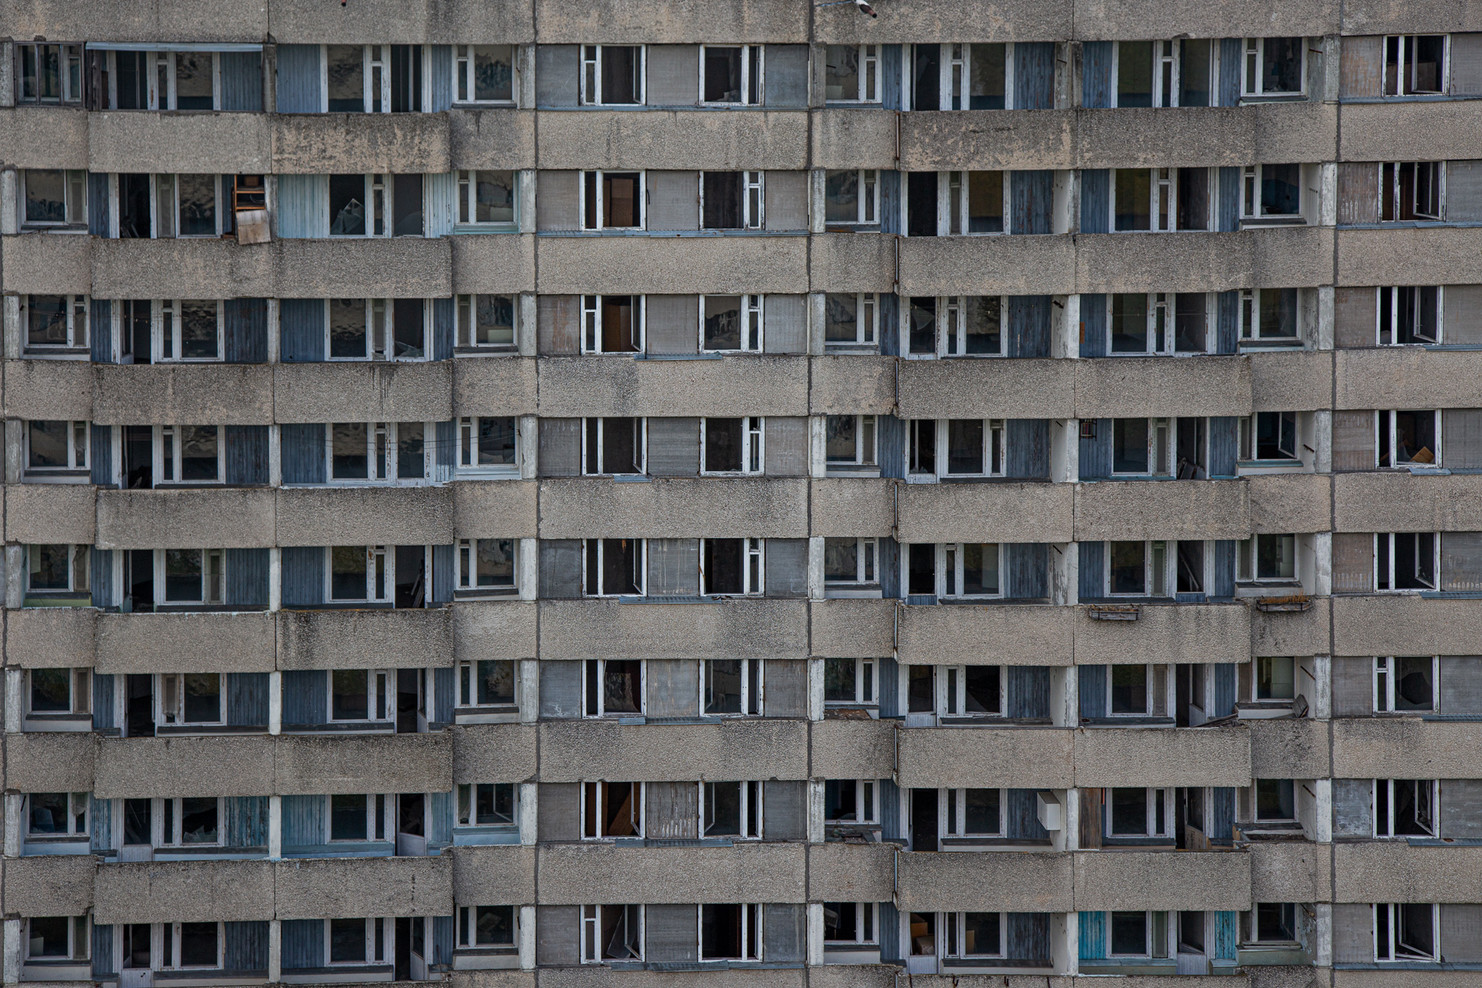 Immeuble d'habitations